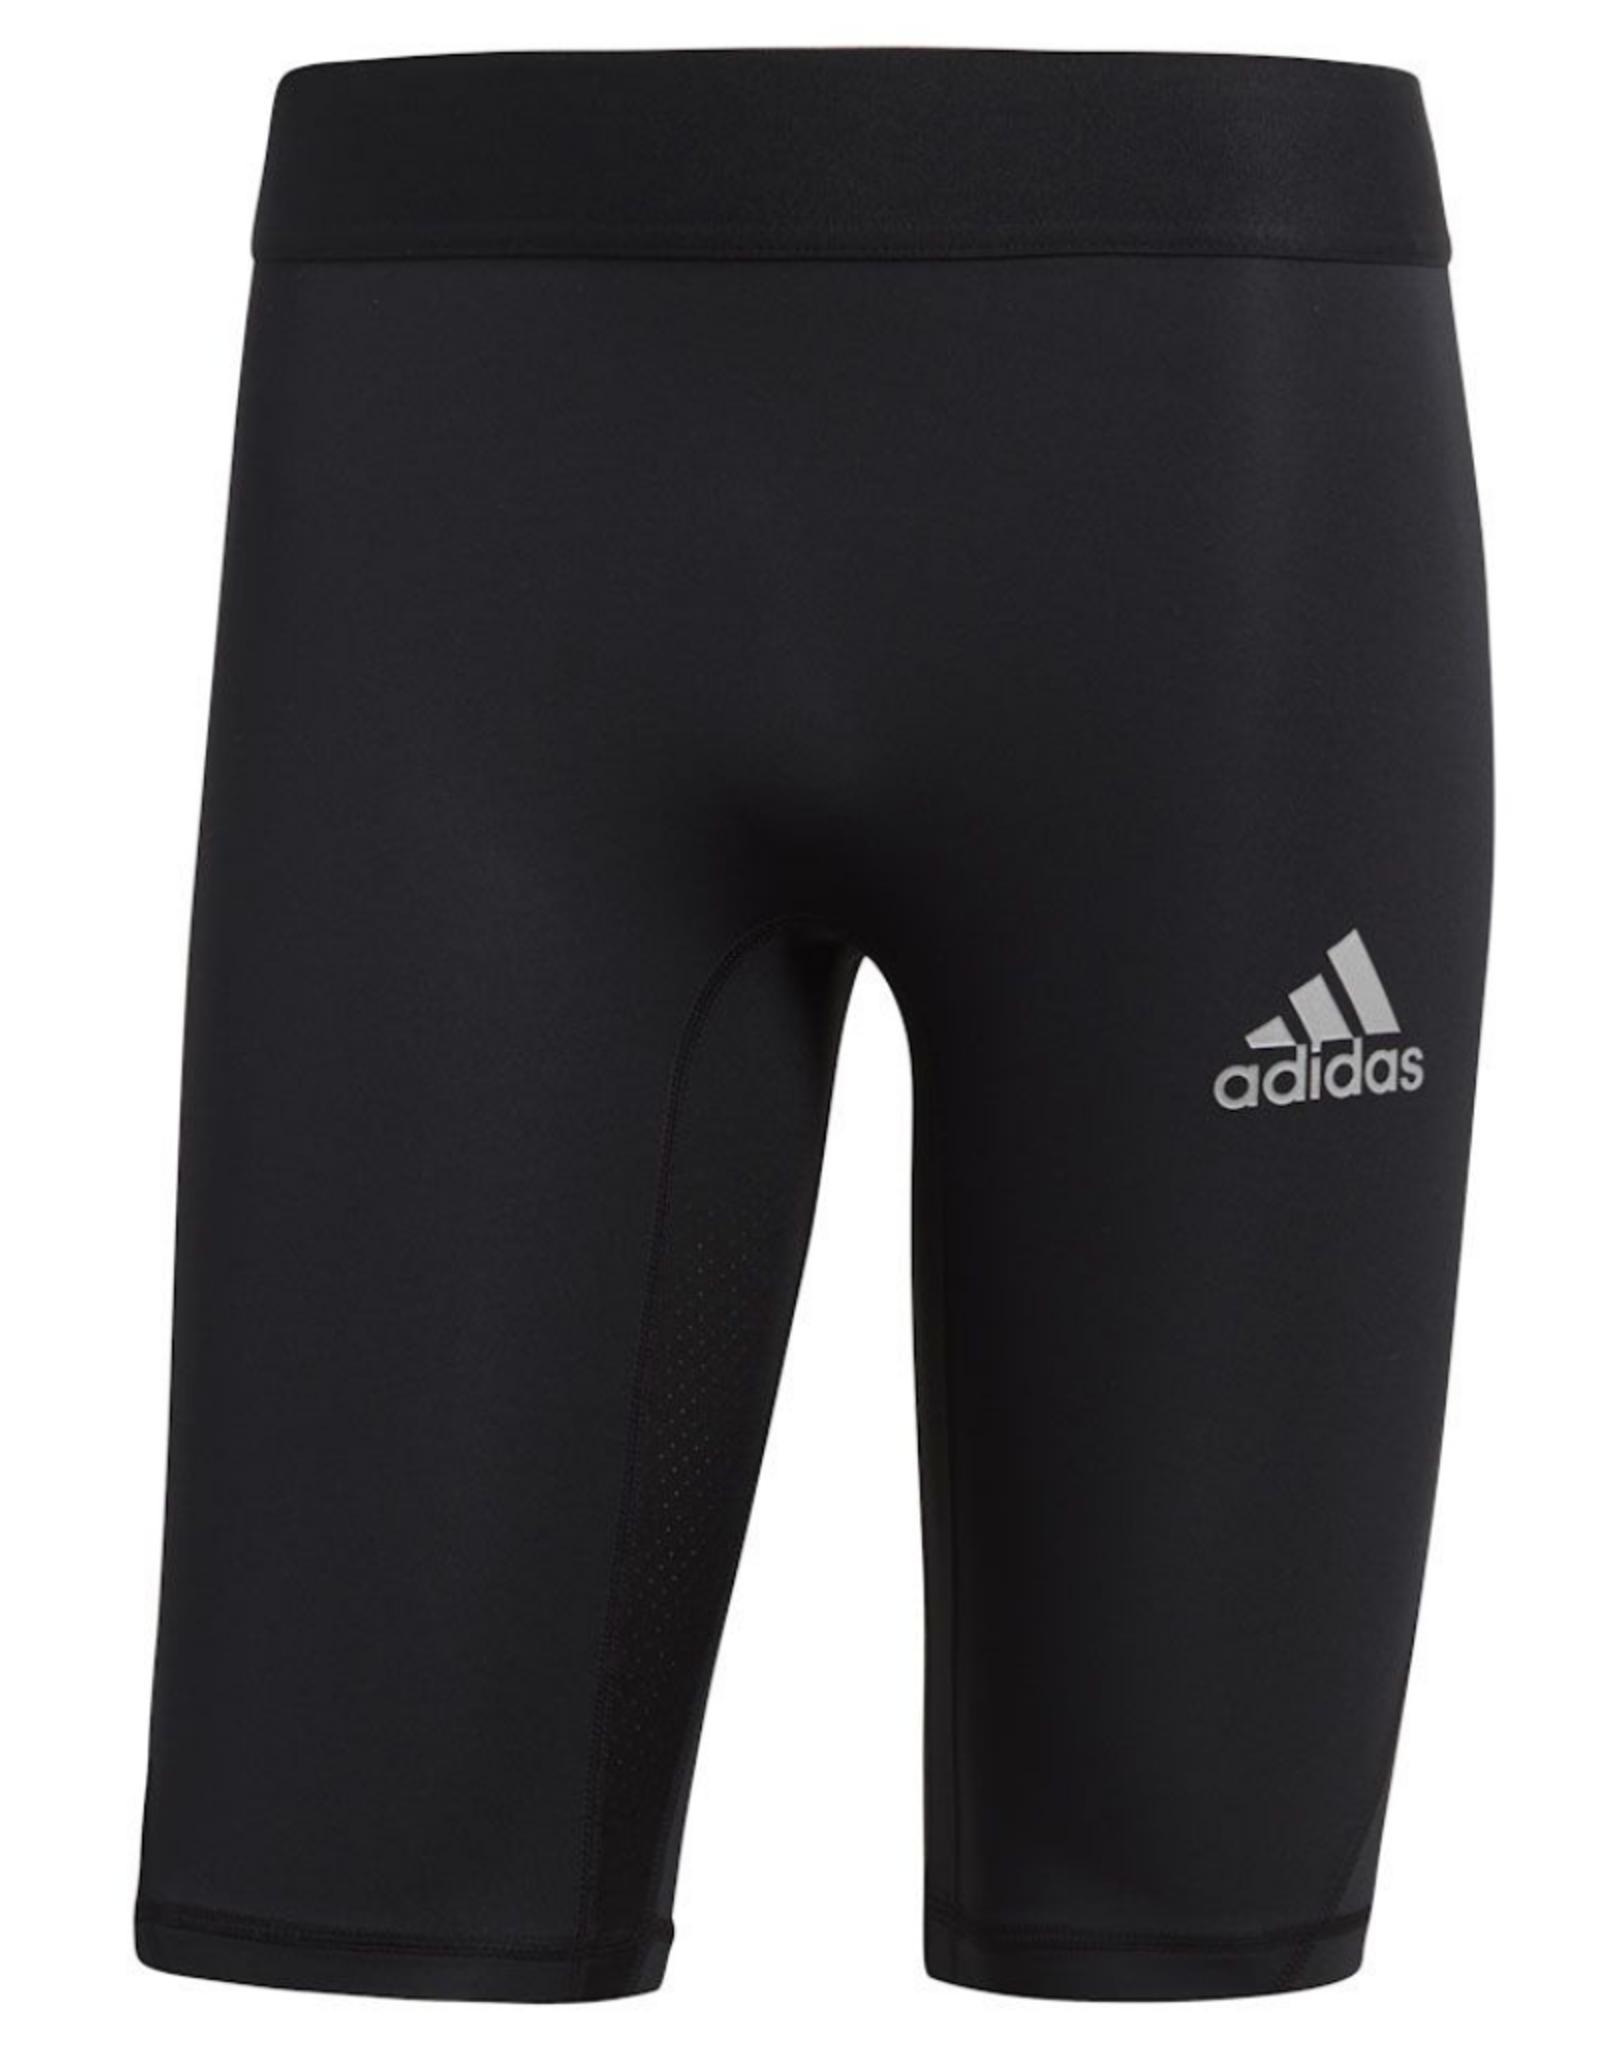 Adidas Adidas Men's Alphaskin Compression Short Black